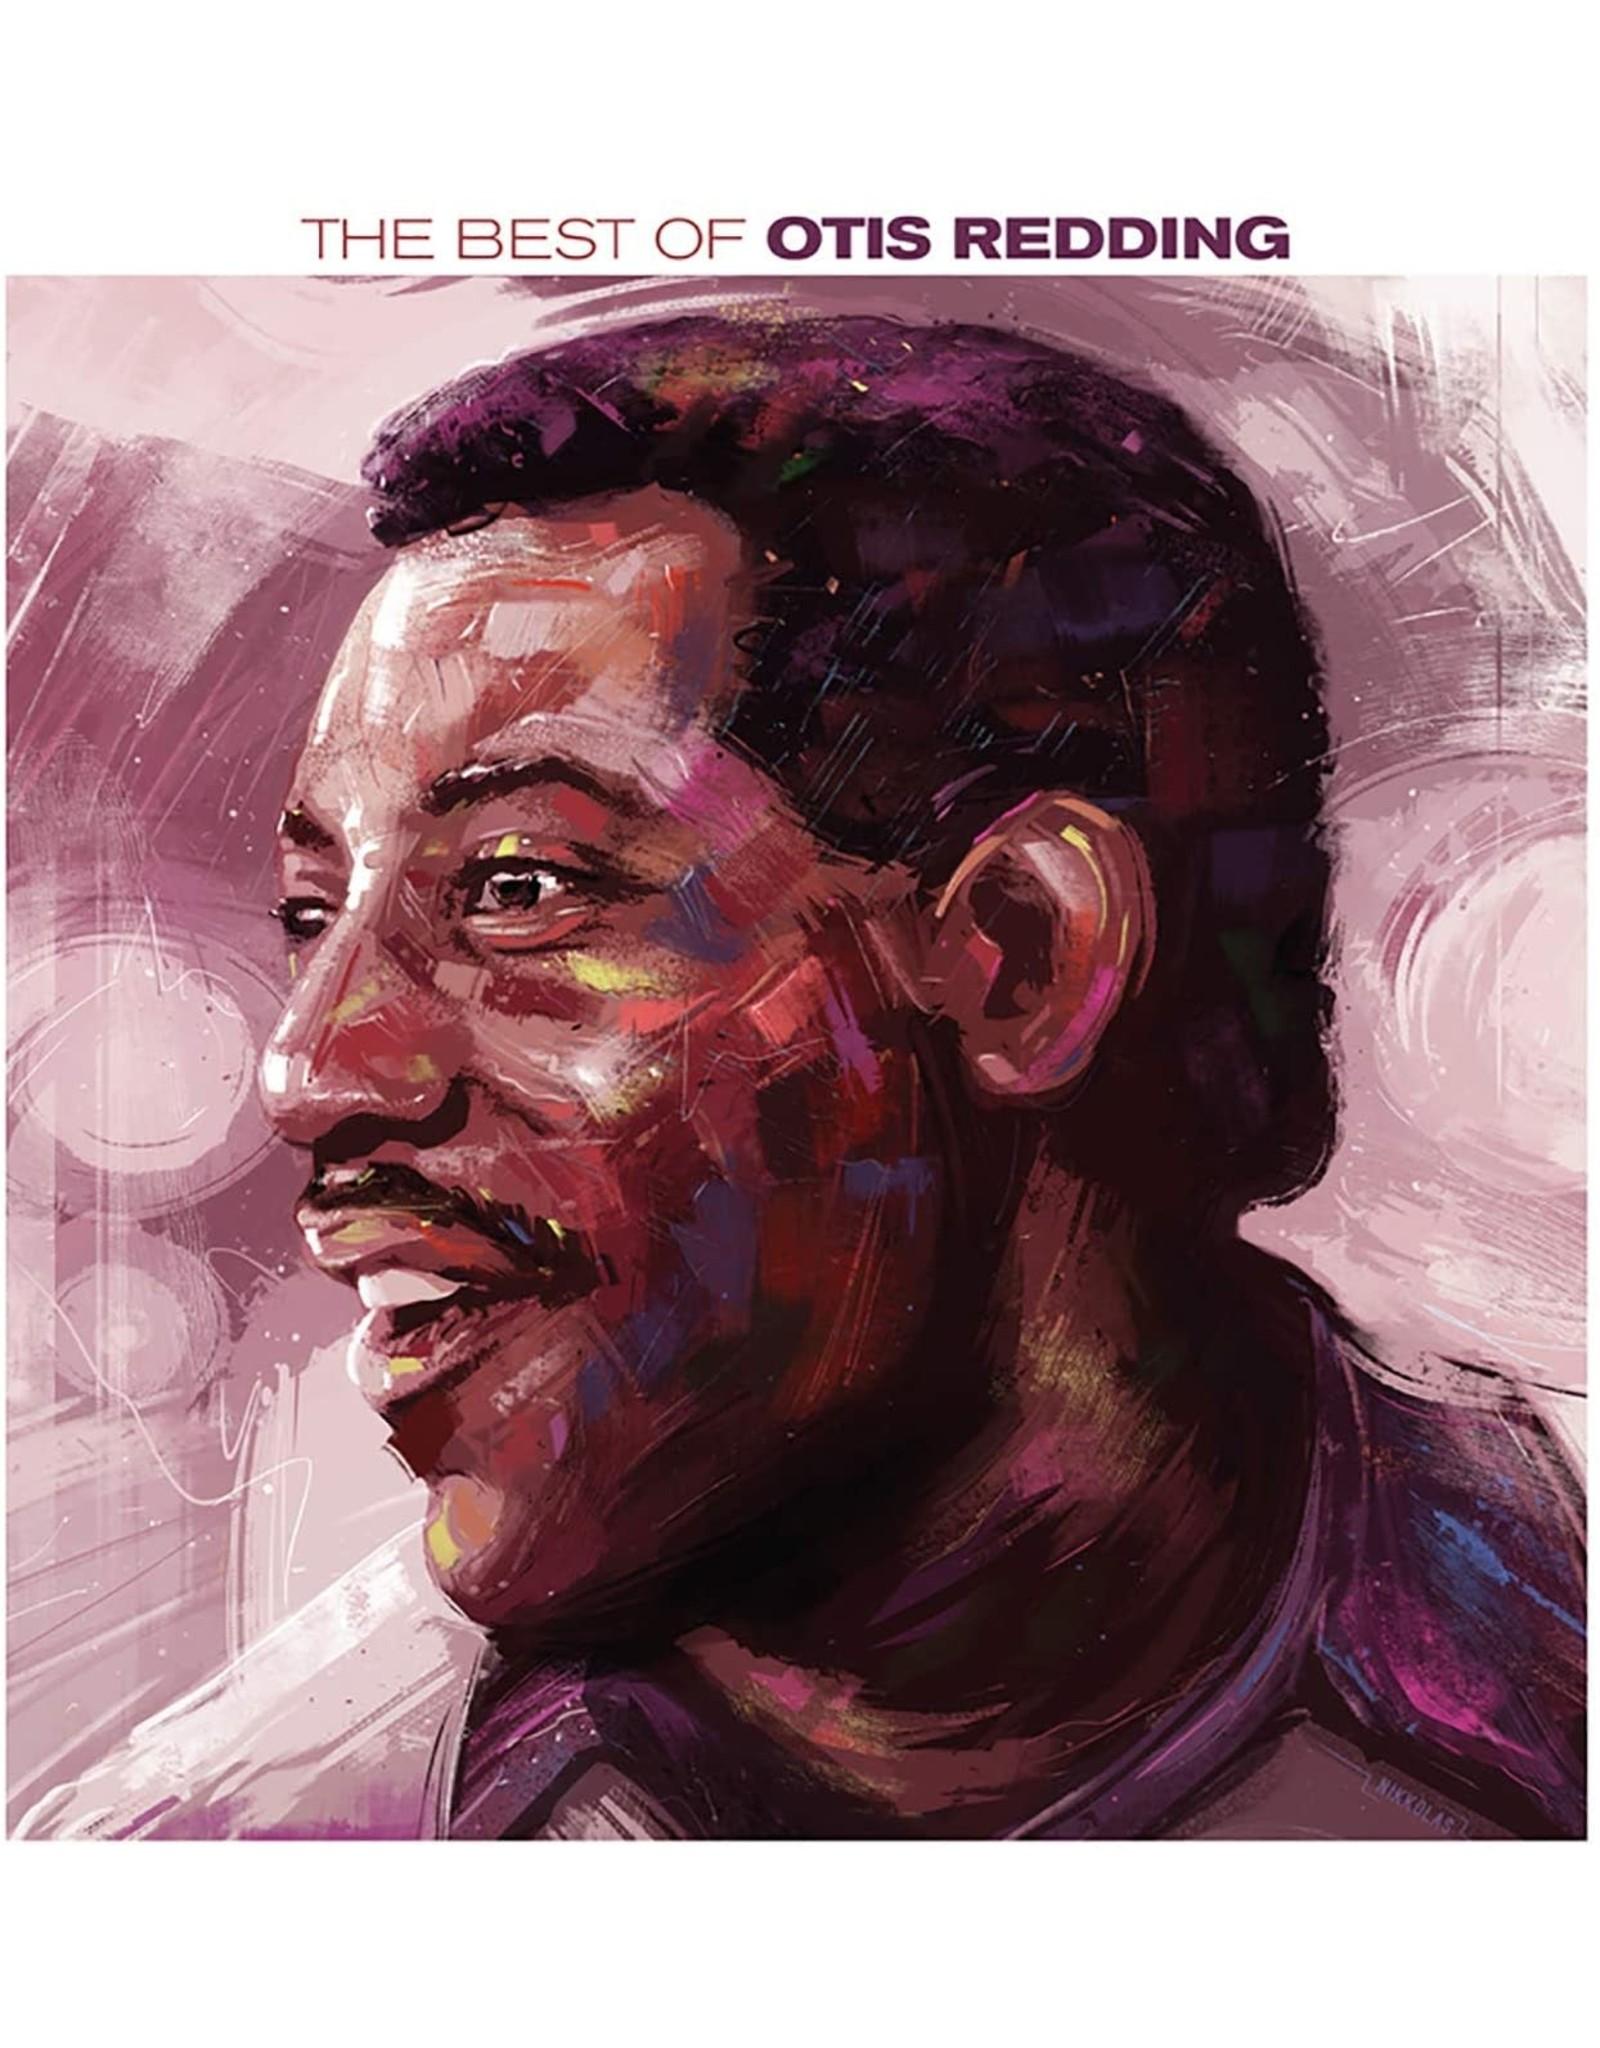 Otis Redding - The Best of Otis Redding (2020 Mono Remaster)